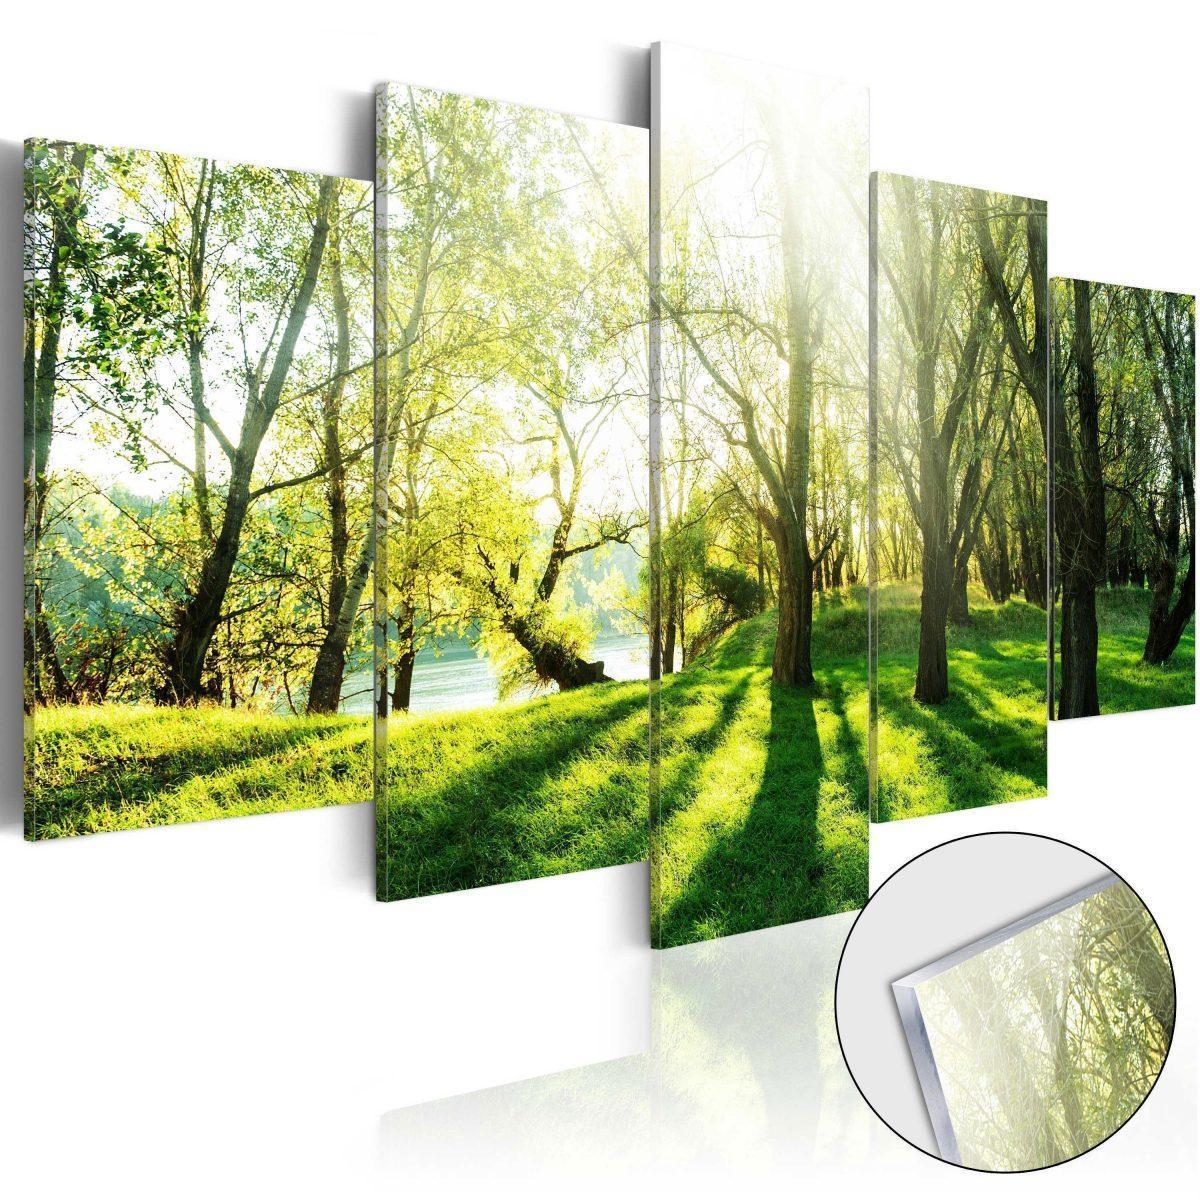 Tavla i akrylglas - Green Glade - 100x50